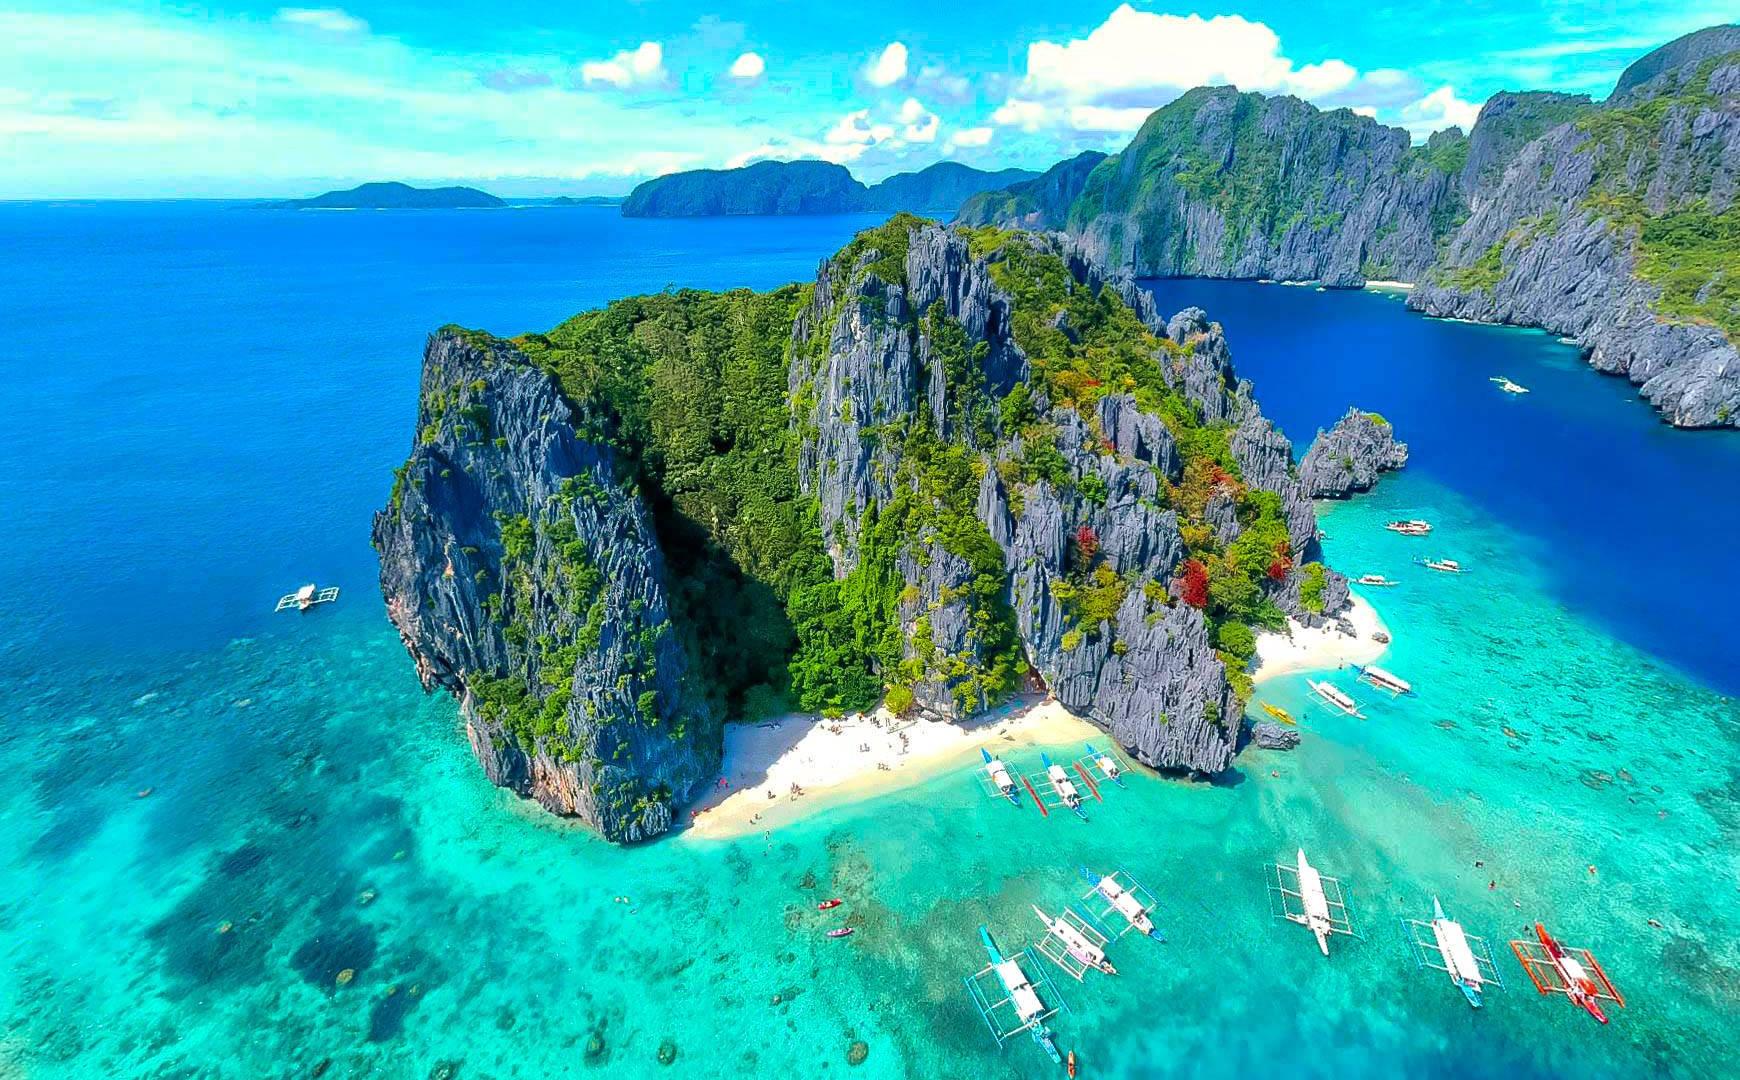 Spectacular-El-Nido-Palawan-Philippines-